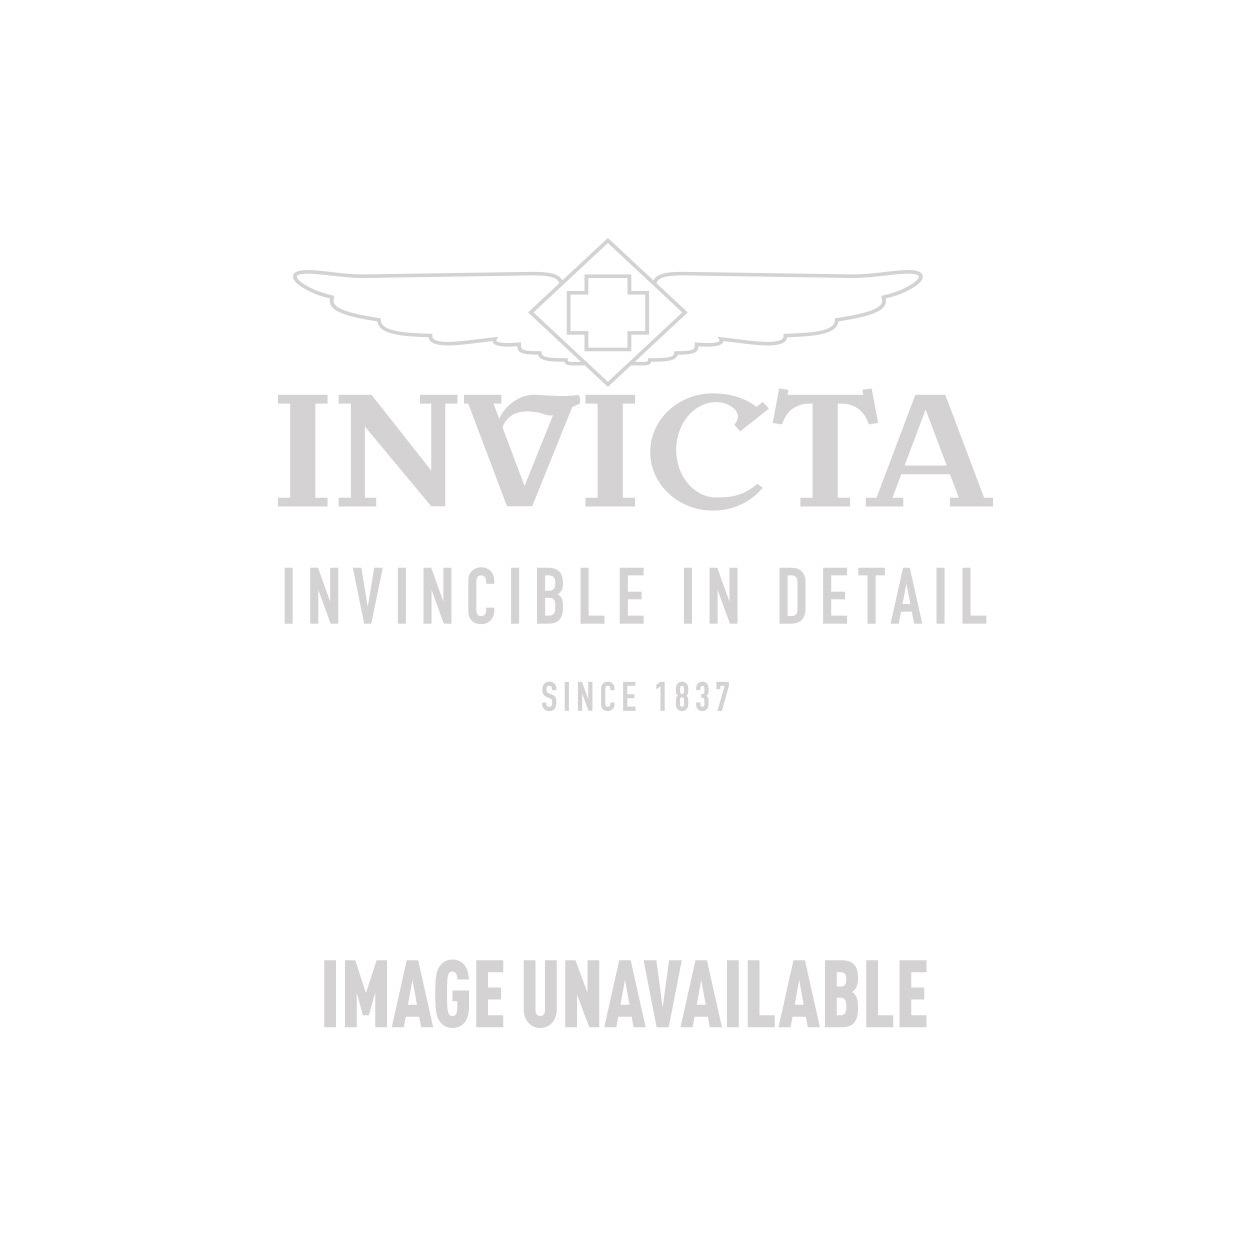 Invicta Bolt Zeus Quartz Watch - Gold, Stainless Steel case with White tone  Polyurethane band